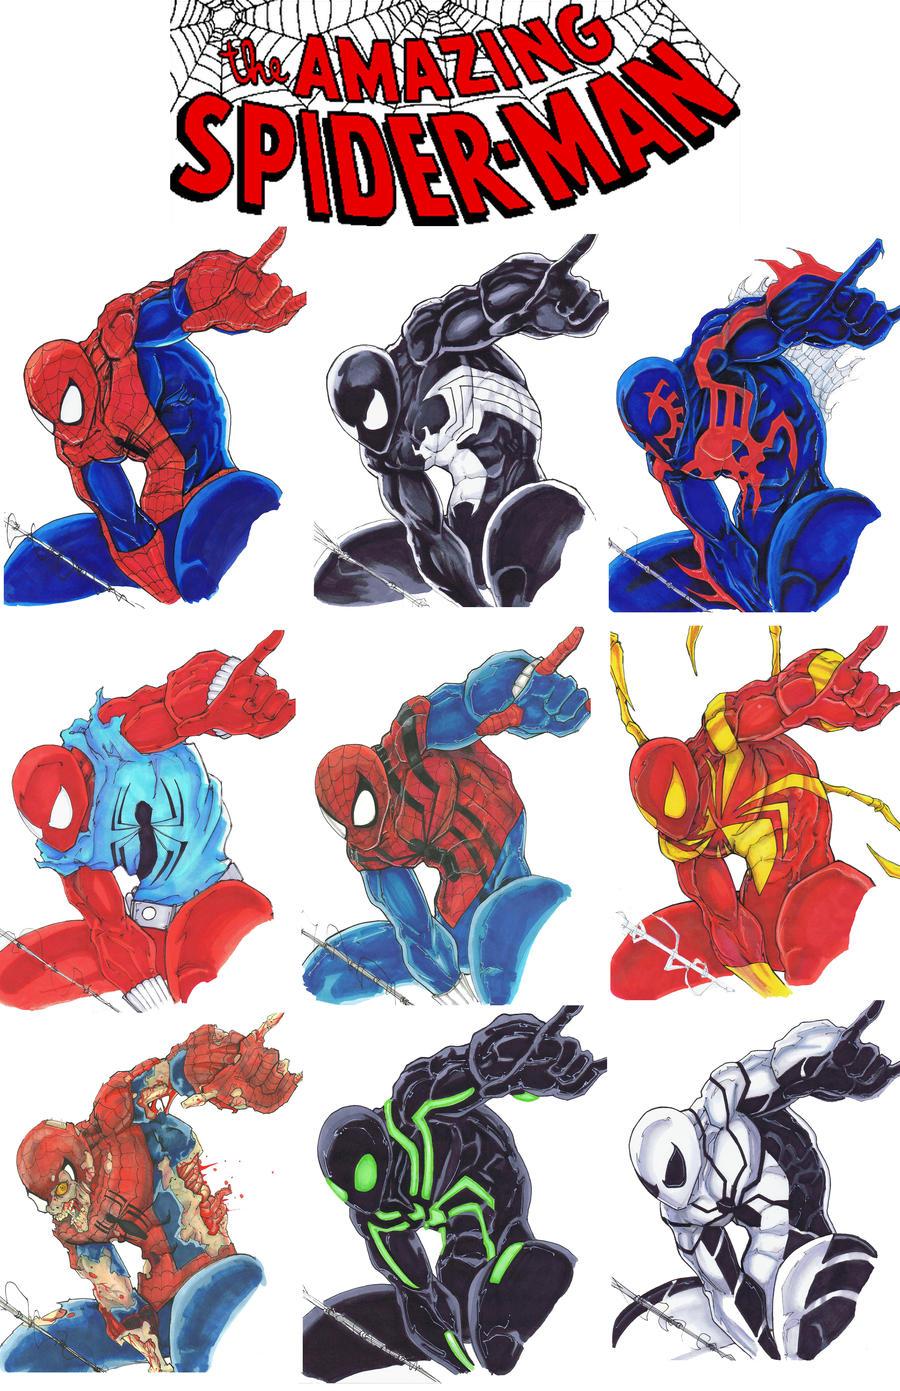 Spider-man Costume by ChrisOzFulton on DeviantArt